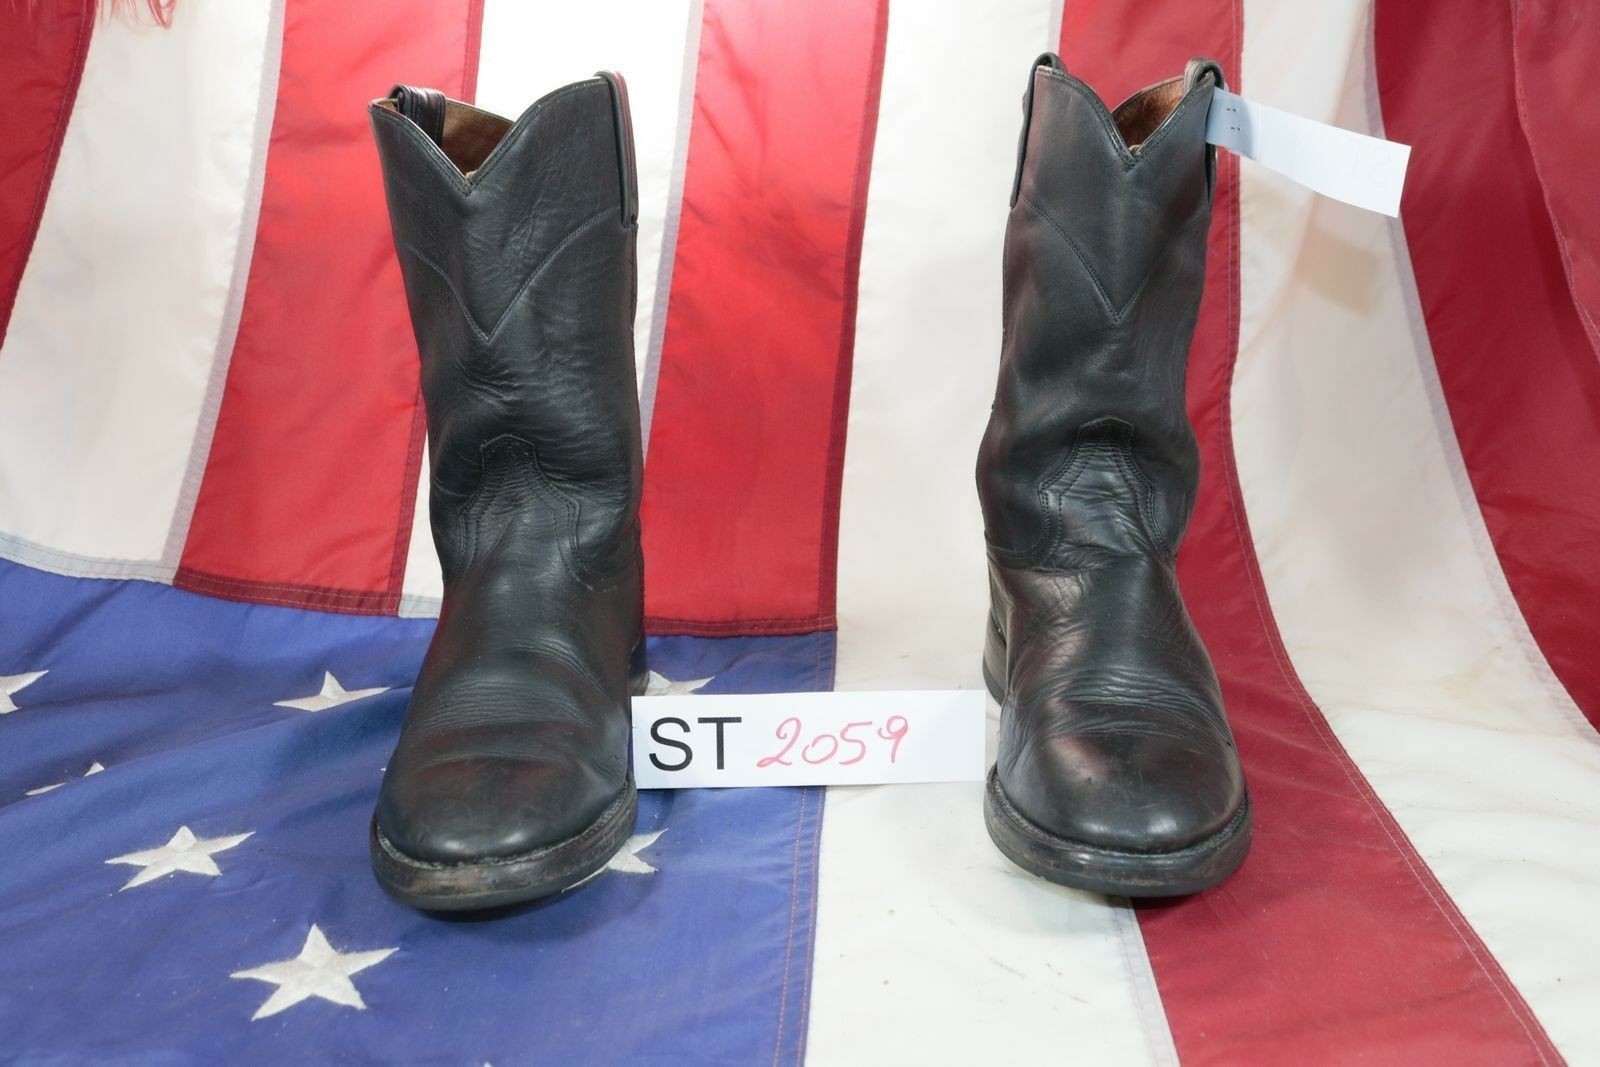 Boots Marlbgold Classic ( Cod. St2059) Used N.41 Mens Black Leather Cowboy Bike